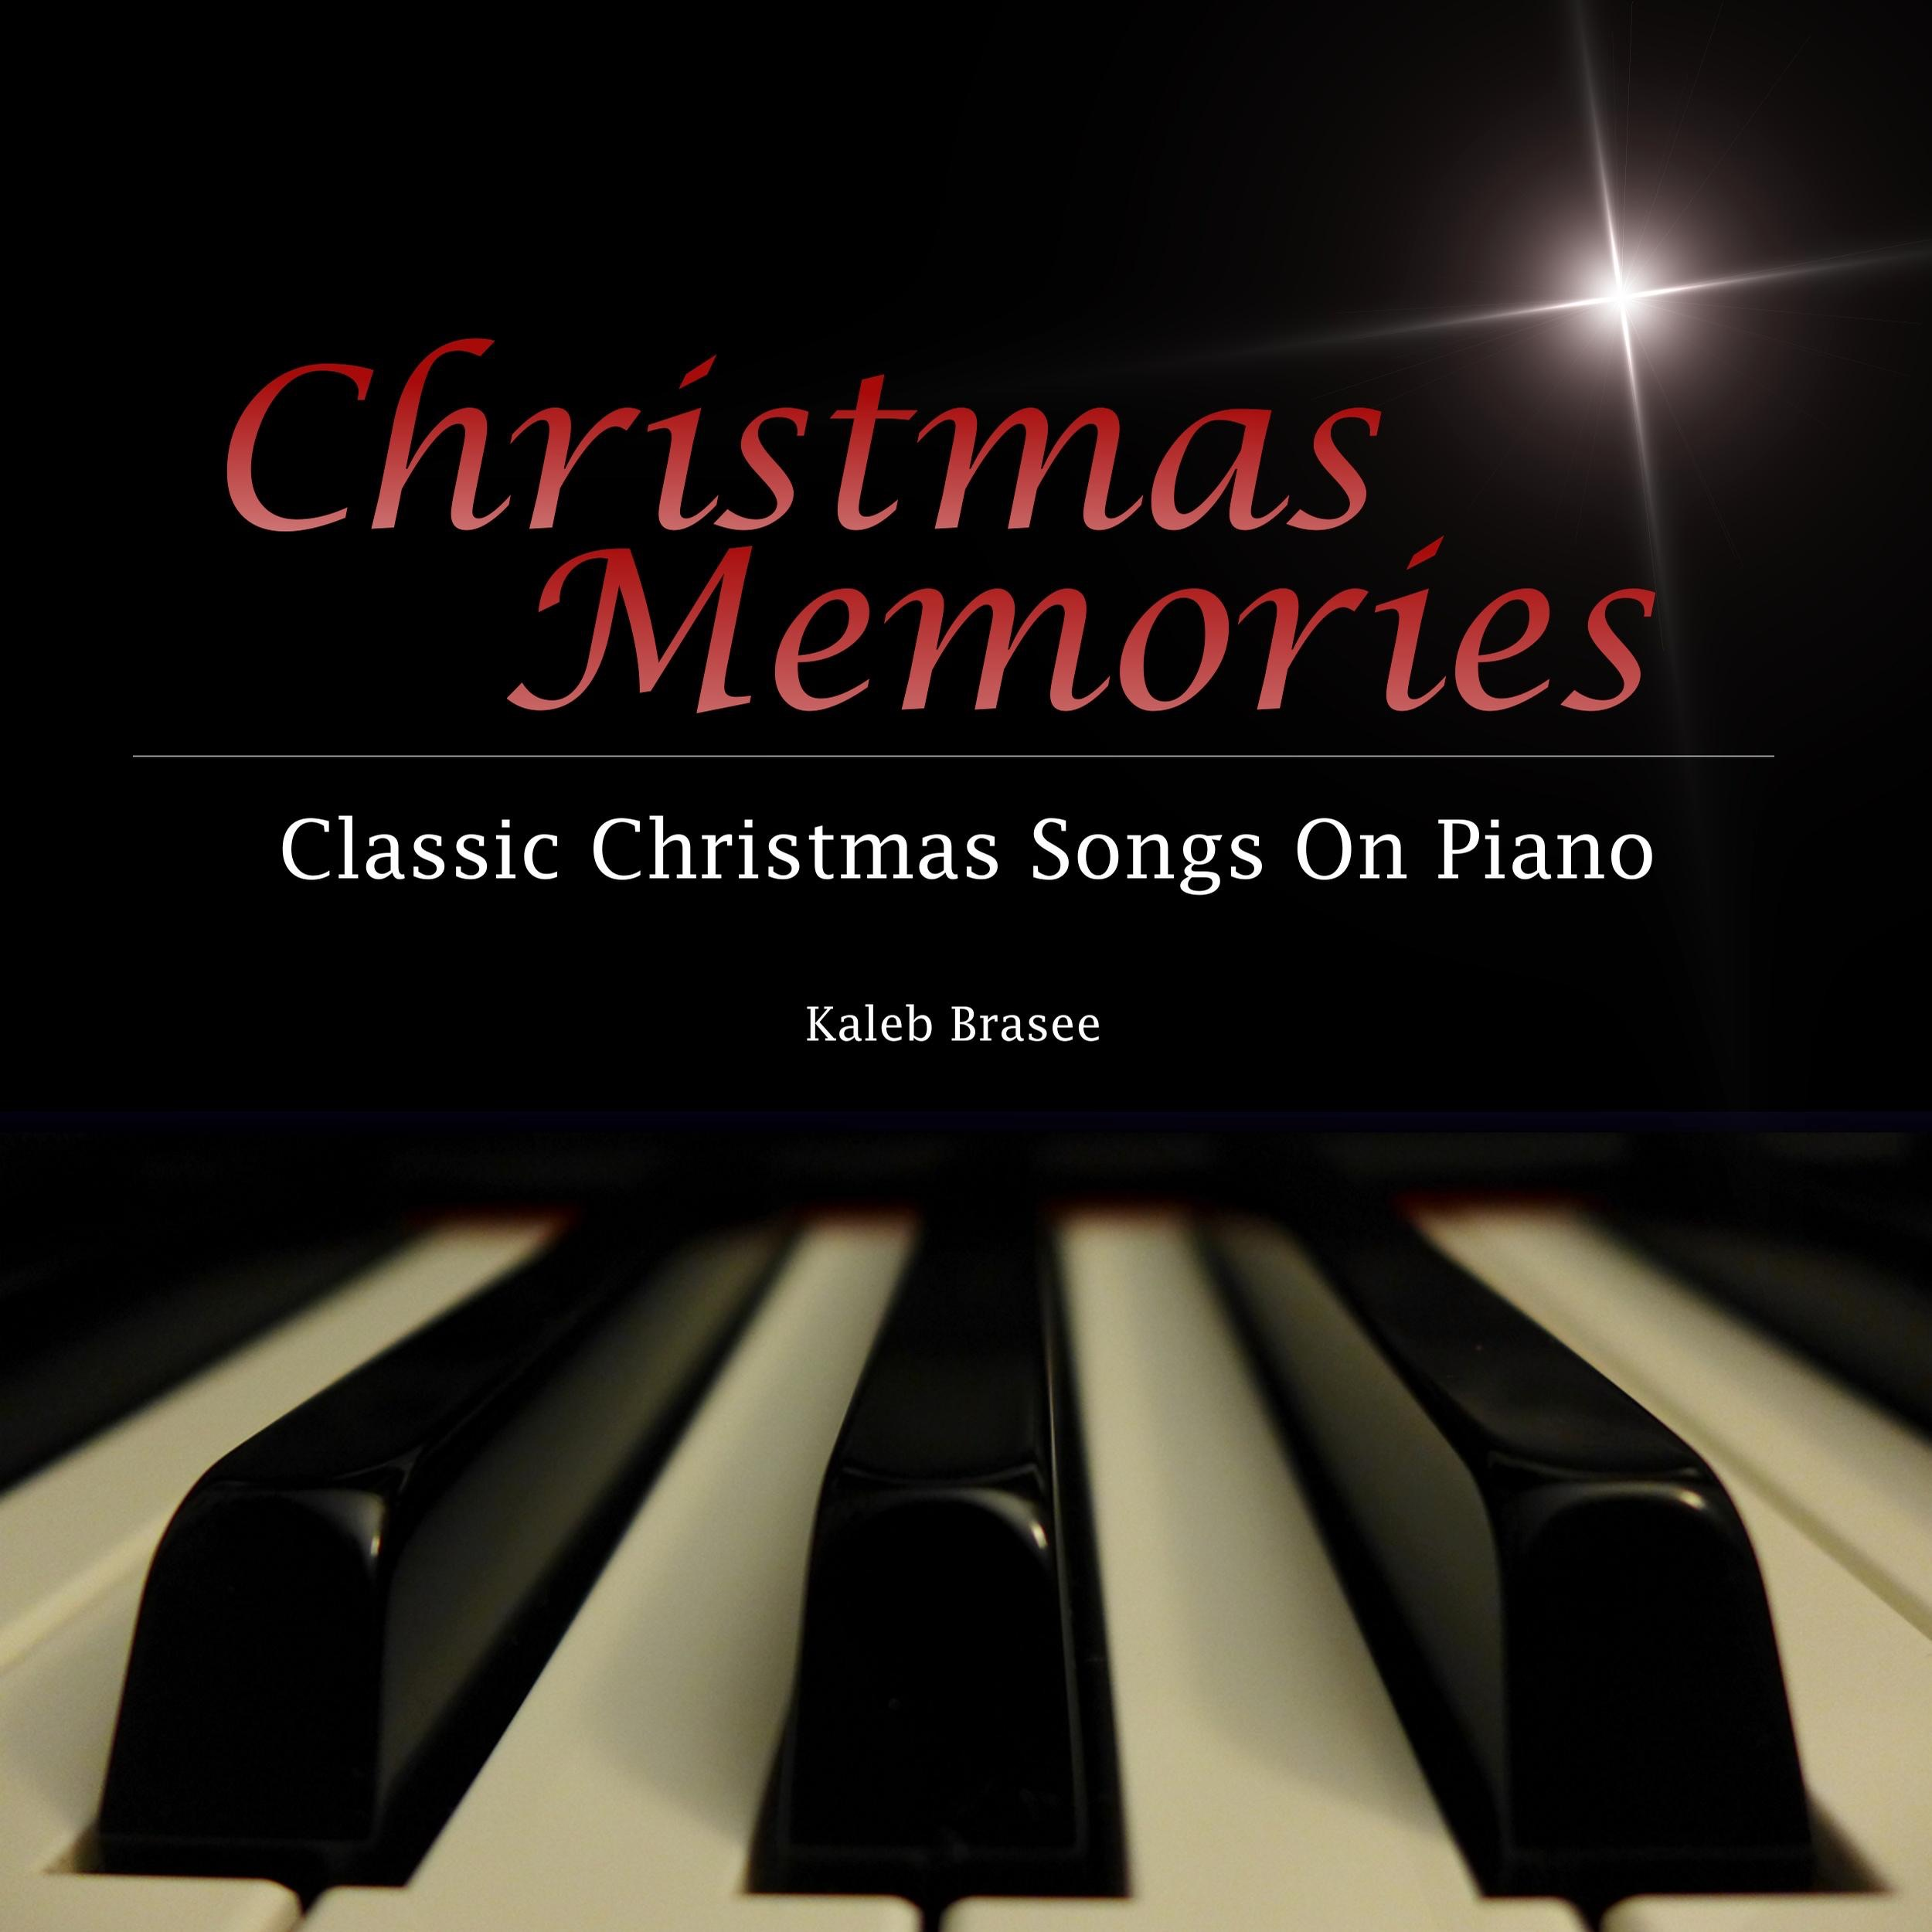 Christmas Memories: Classic Christmas Songs on Piano